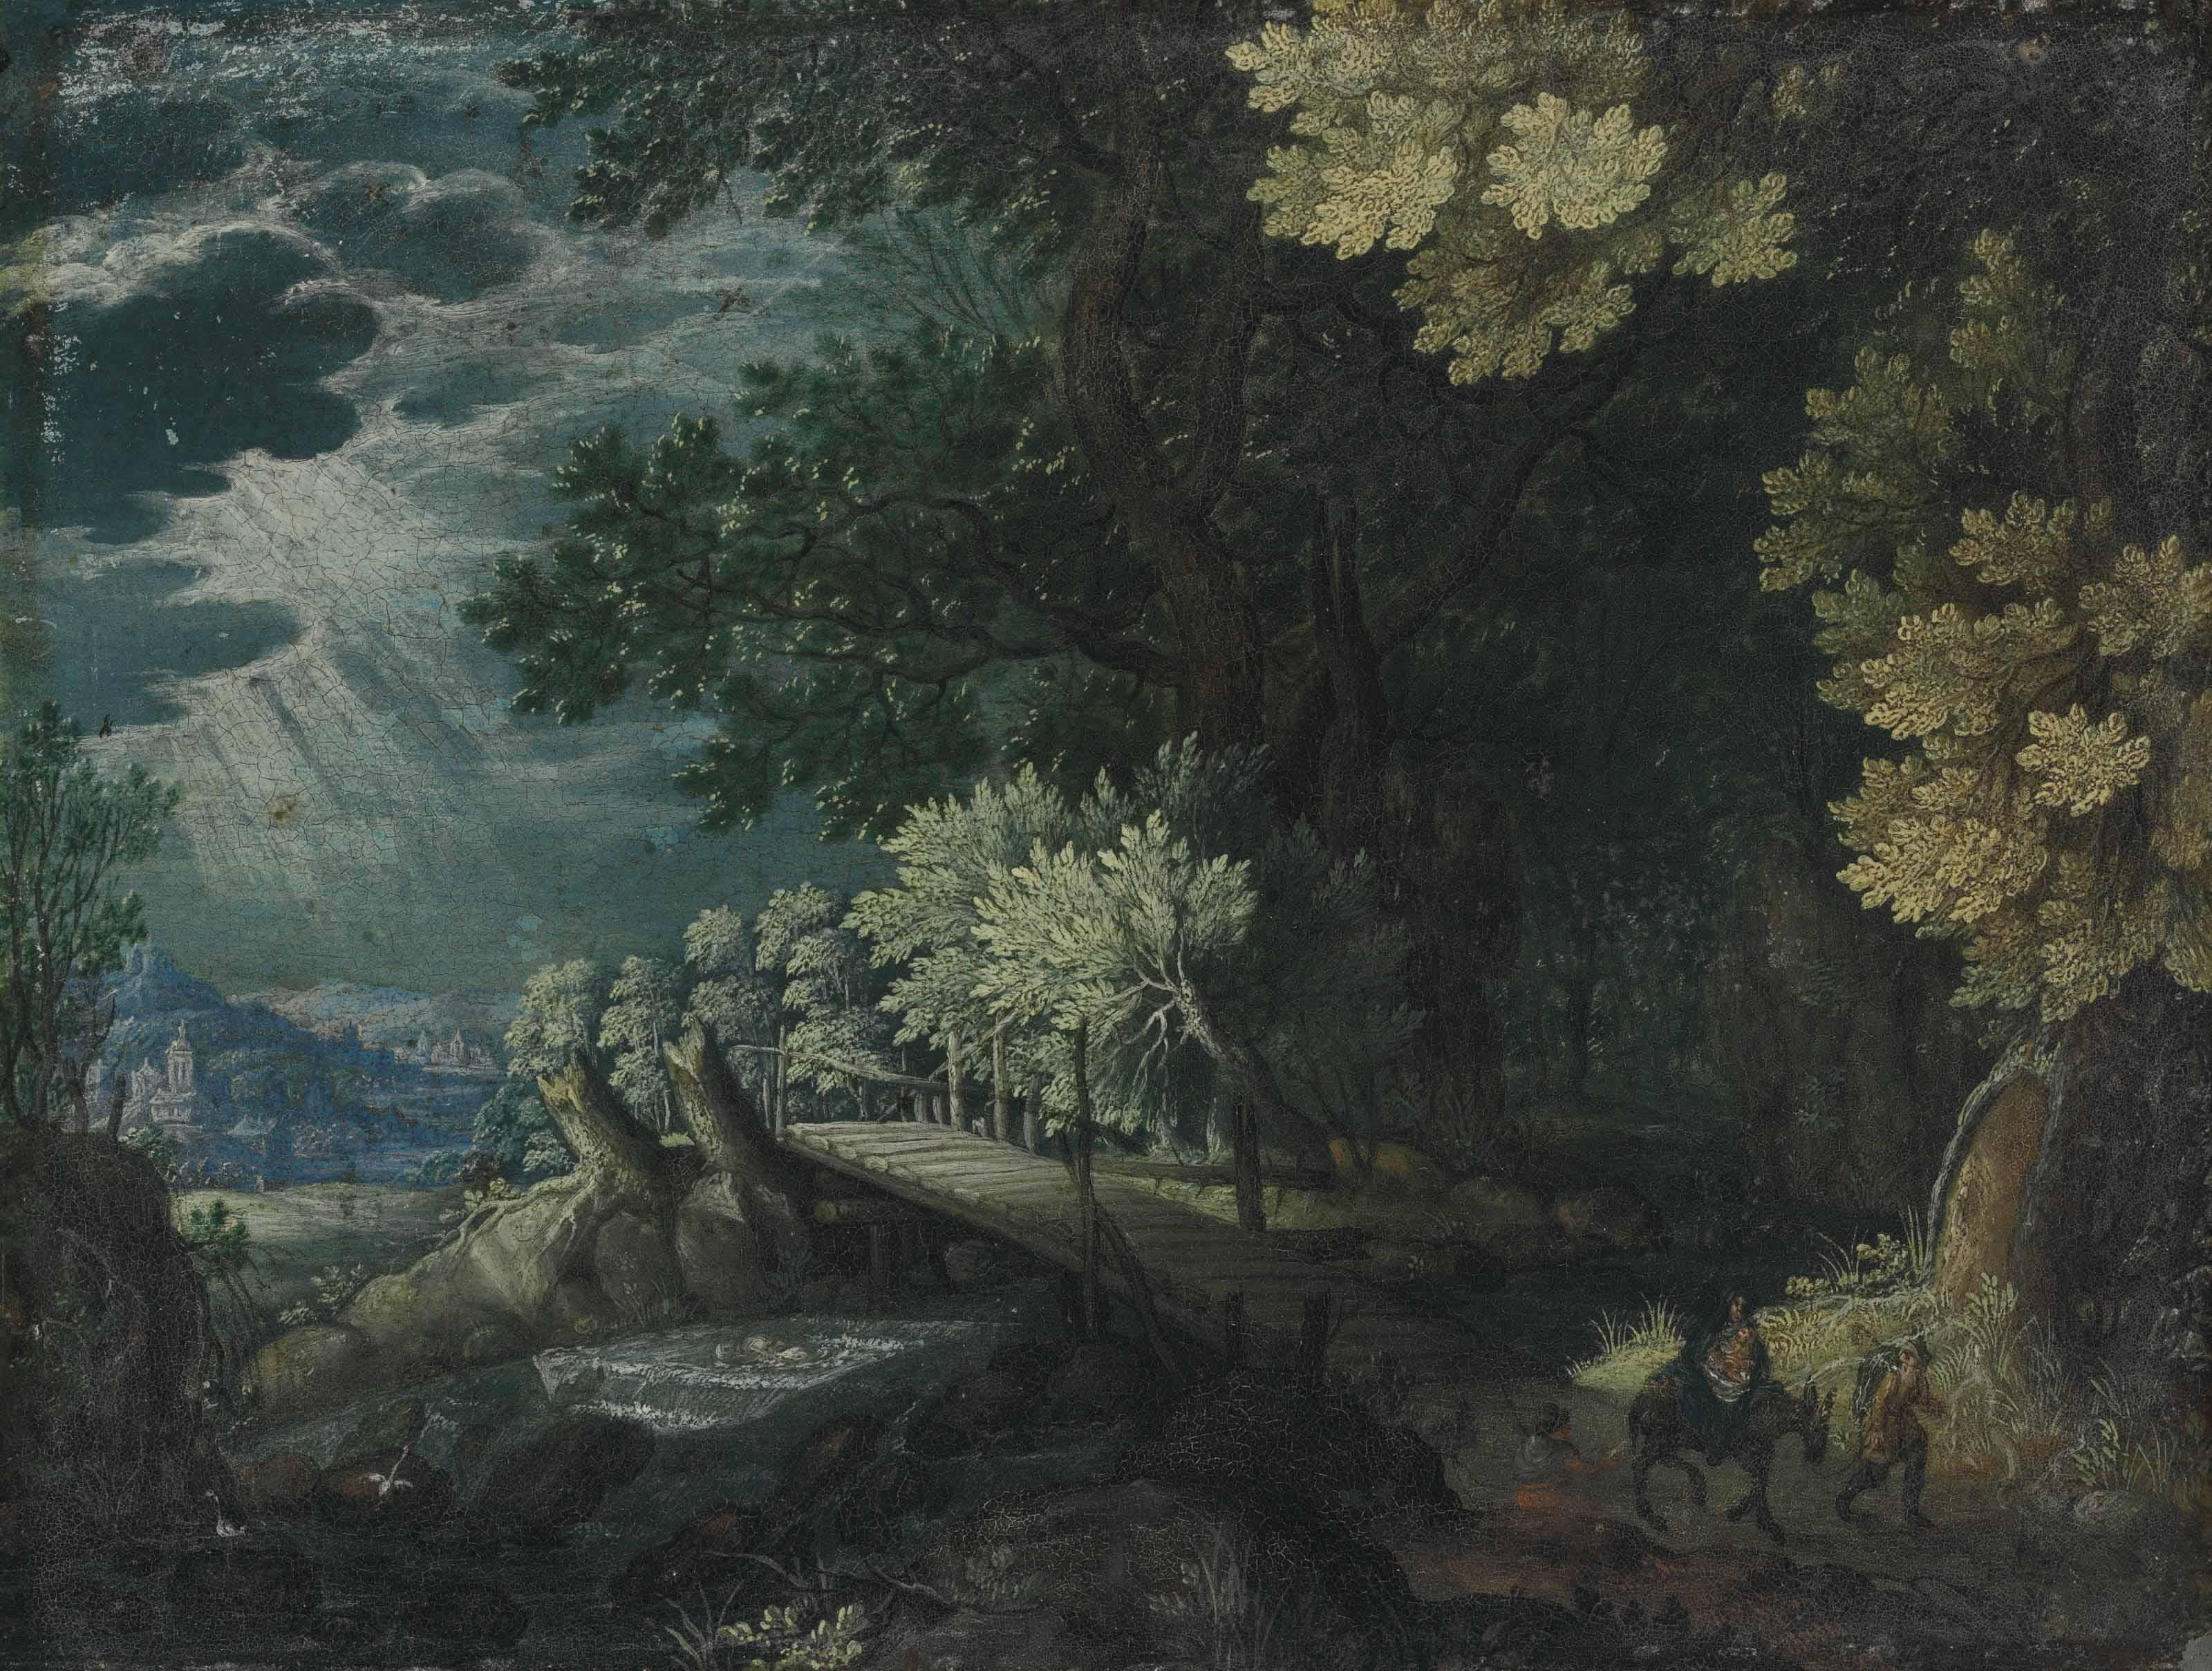 Flemish School, early 17th cen